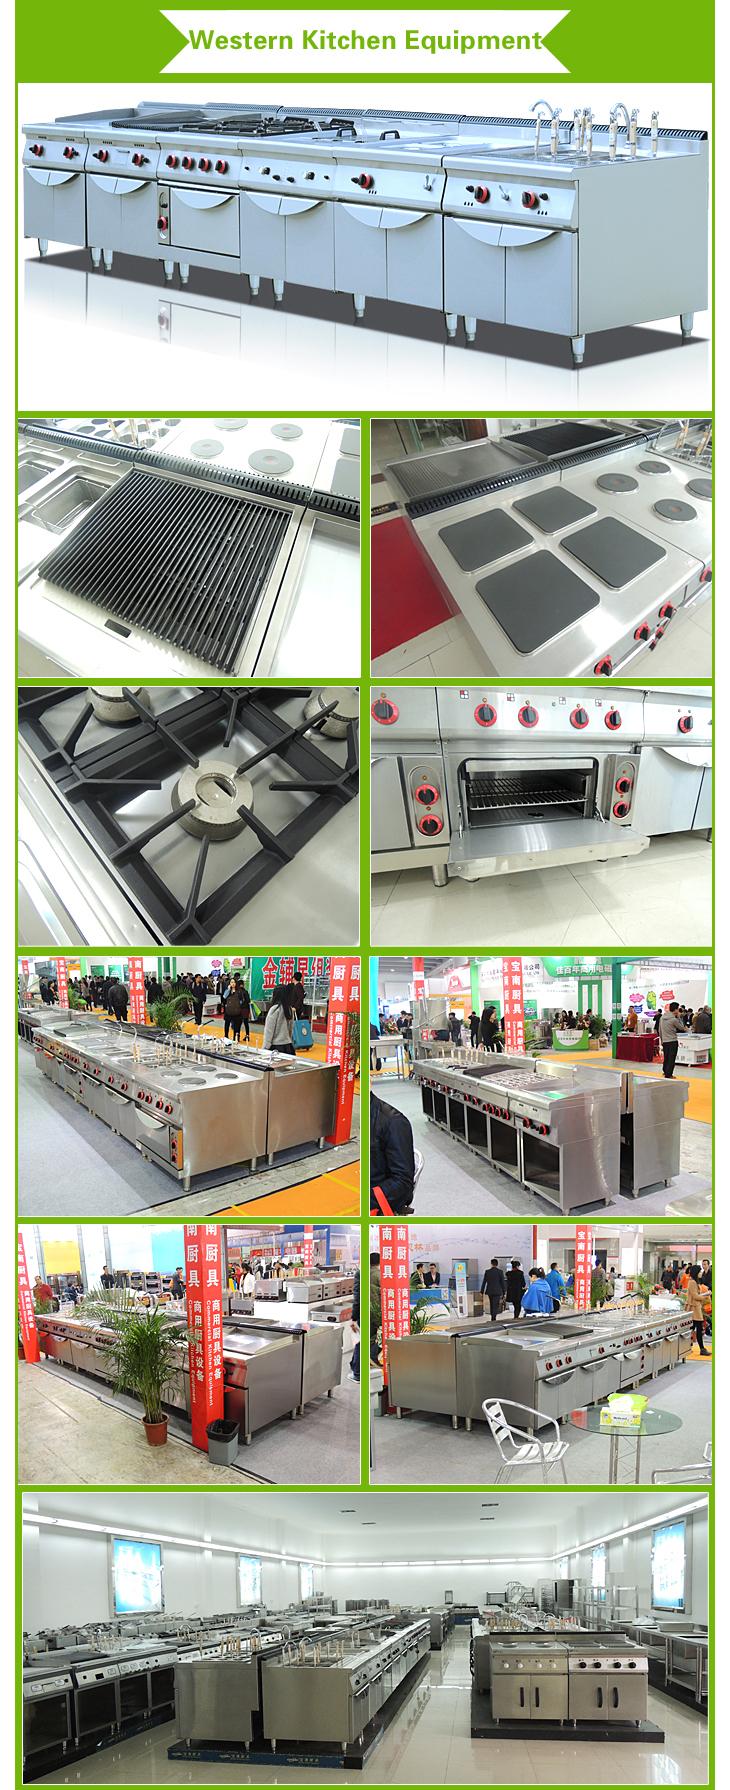 Cosbao names of kitchen equipments restaurant equipment 900 600 view -  Bn W35 Kitchen Heavy Duty Metal Work Bench Stainless Steel Work Table